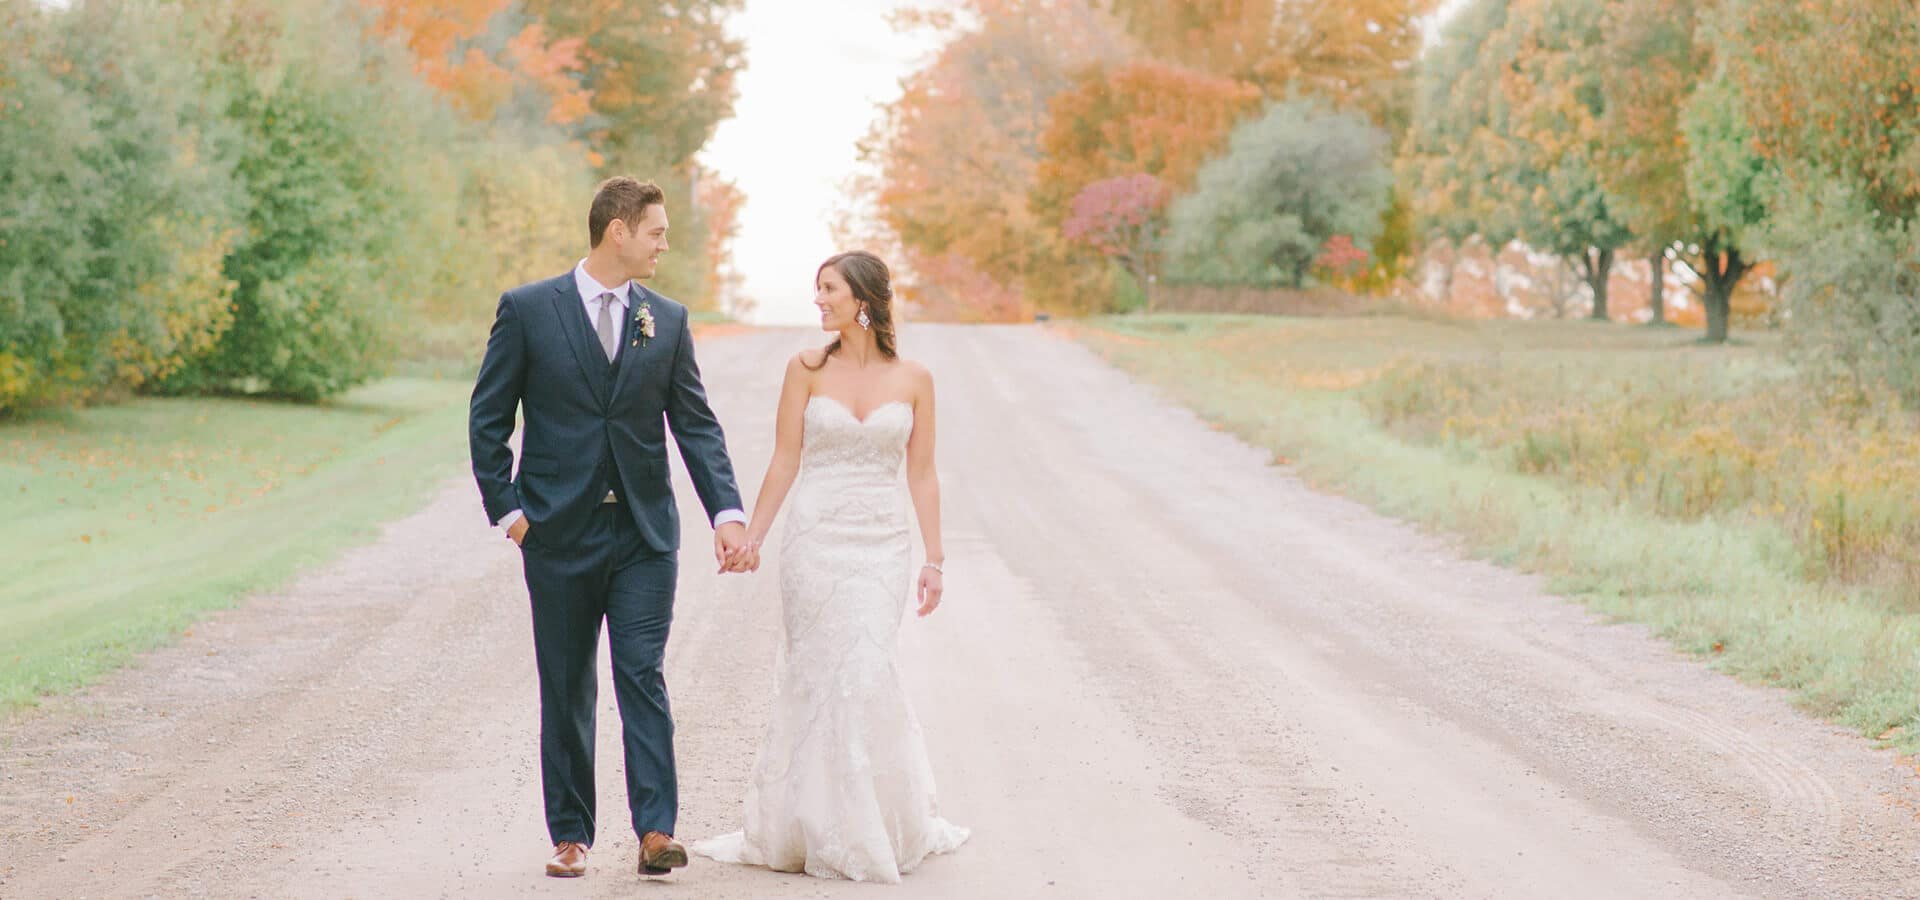 Hero image for Megan and Alec's Sweet Wedding at Nestleton Waters Inn